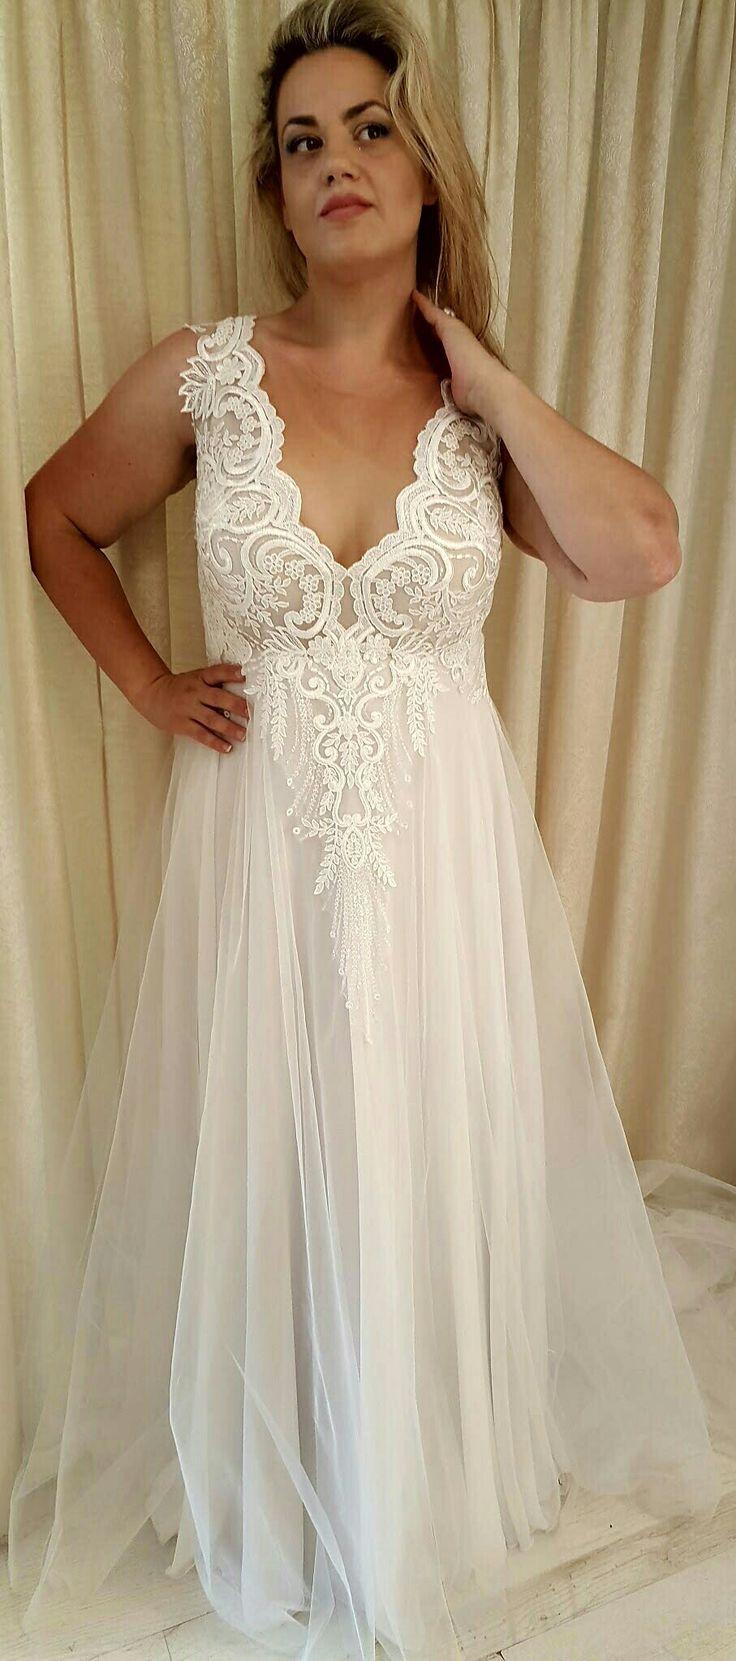 Breath taking plus size wedding dress from studio levana curvy